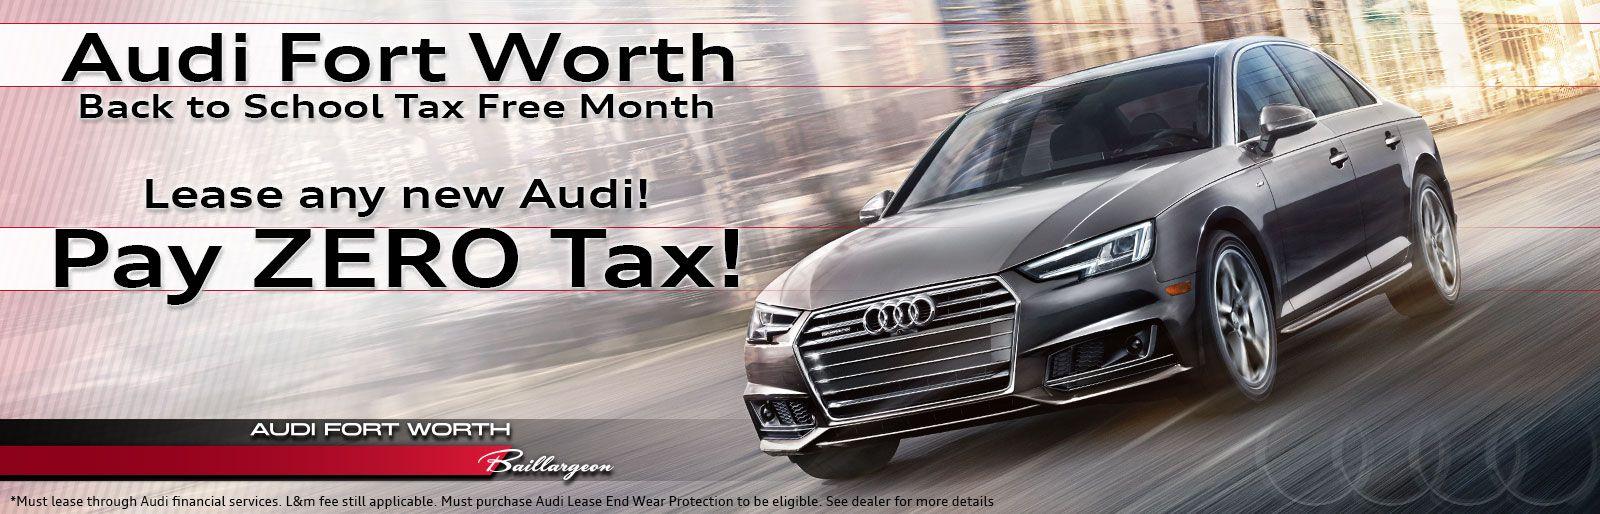 Audi Fort Worth Audi Pinterest Fort Worth - Fort worth audi